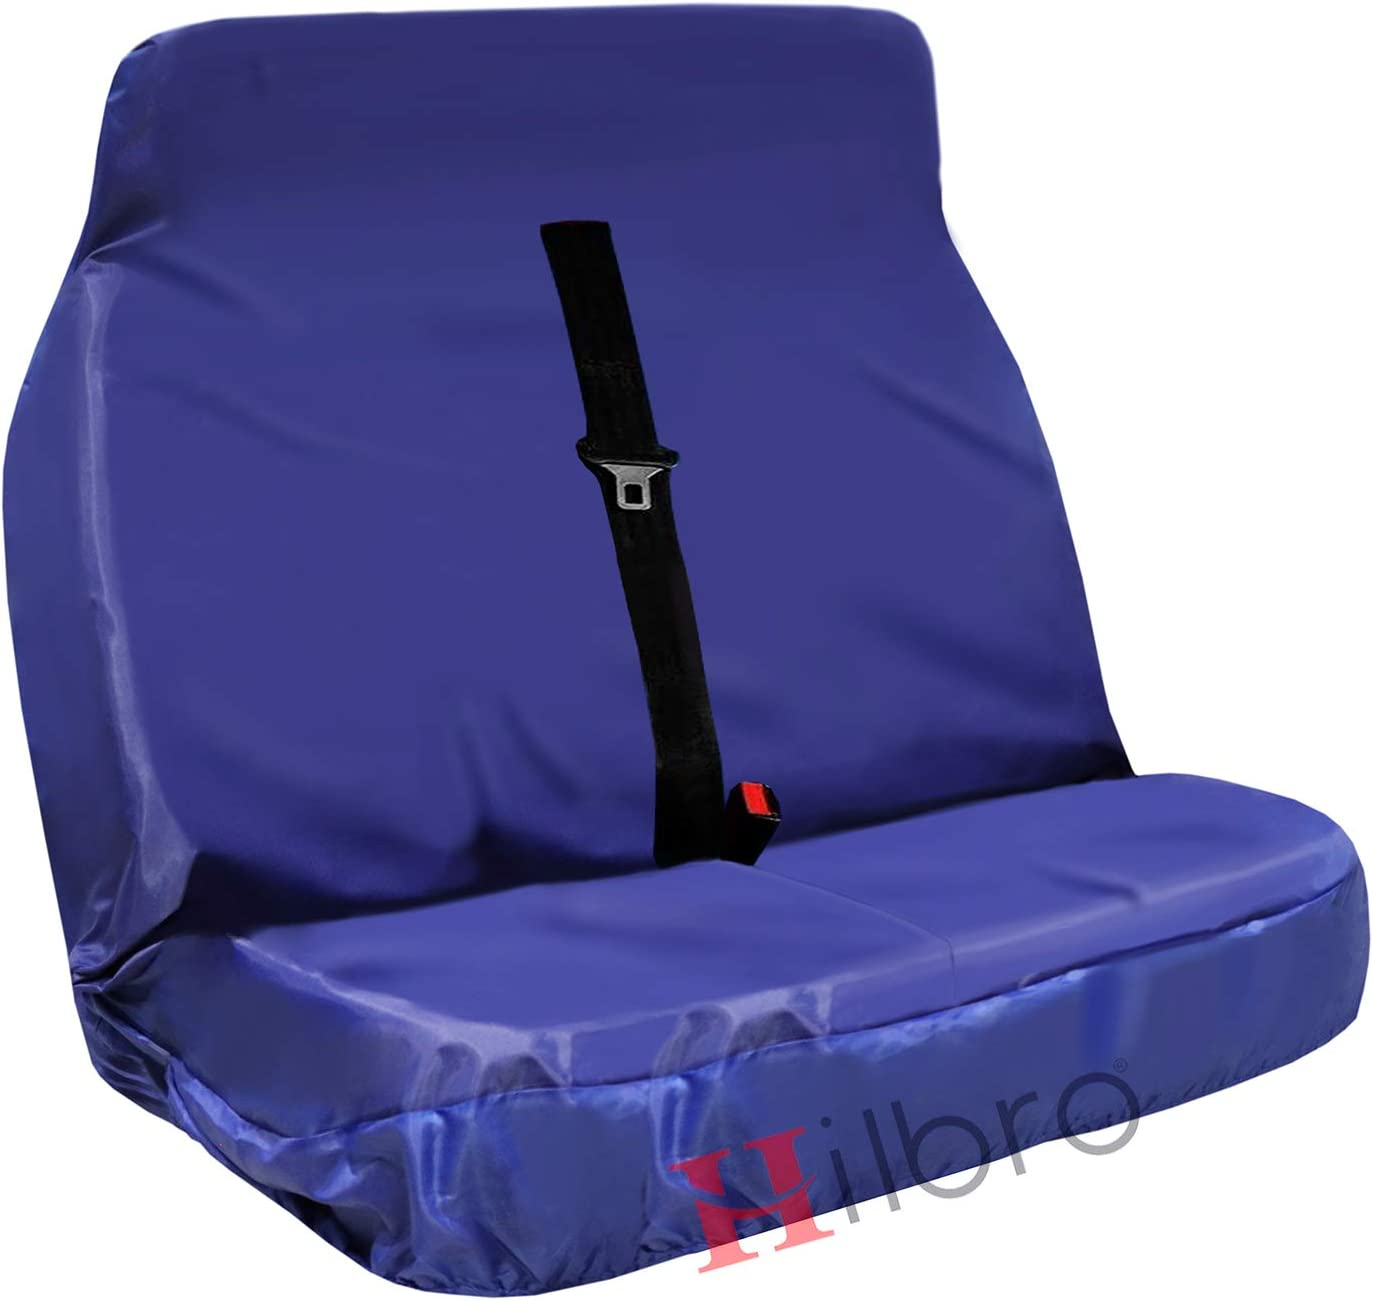 Hilbro Transit Custom Heavy Duty 2 1 Waterproof Van Front Seat Covers Single Driver HD2 1 Camo Blue Double passenger